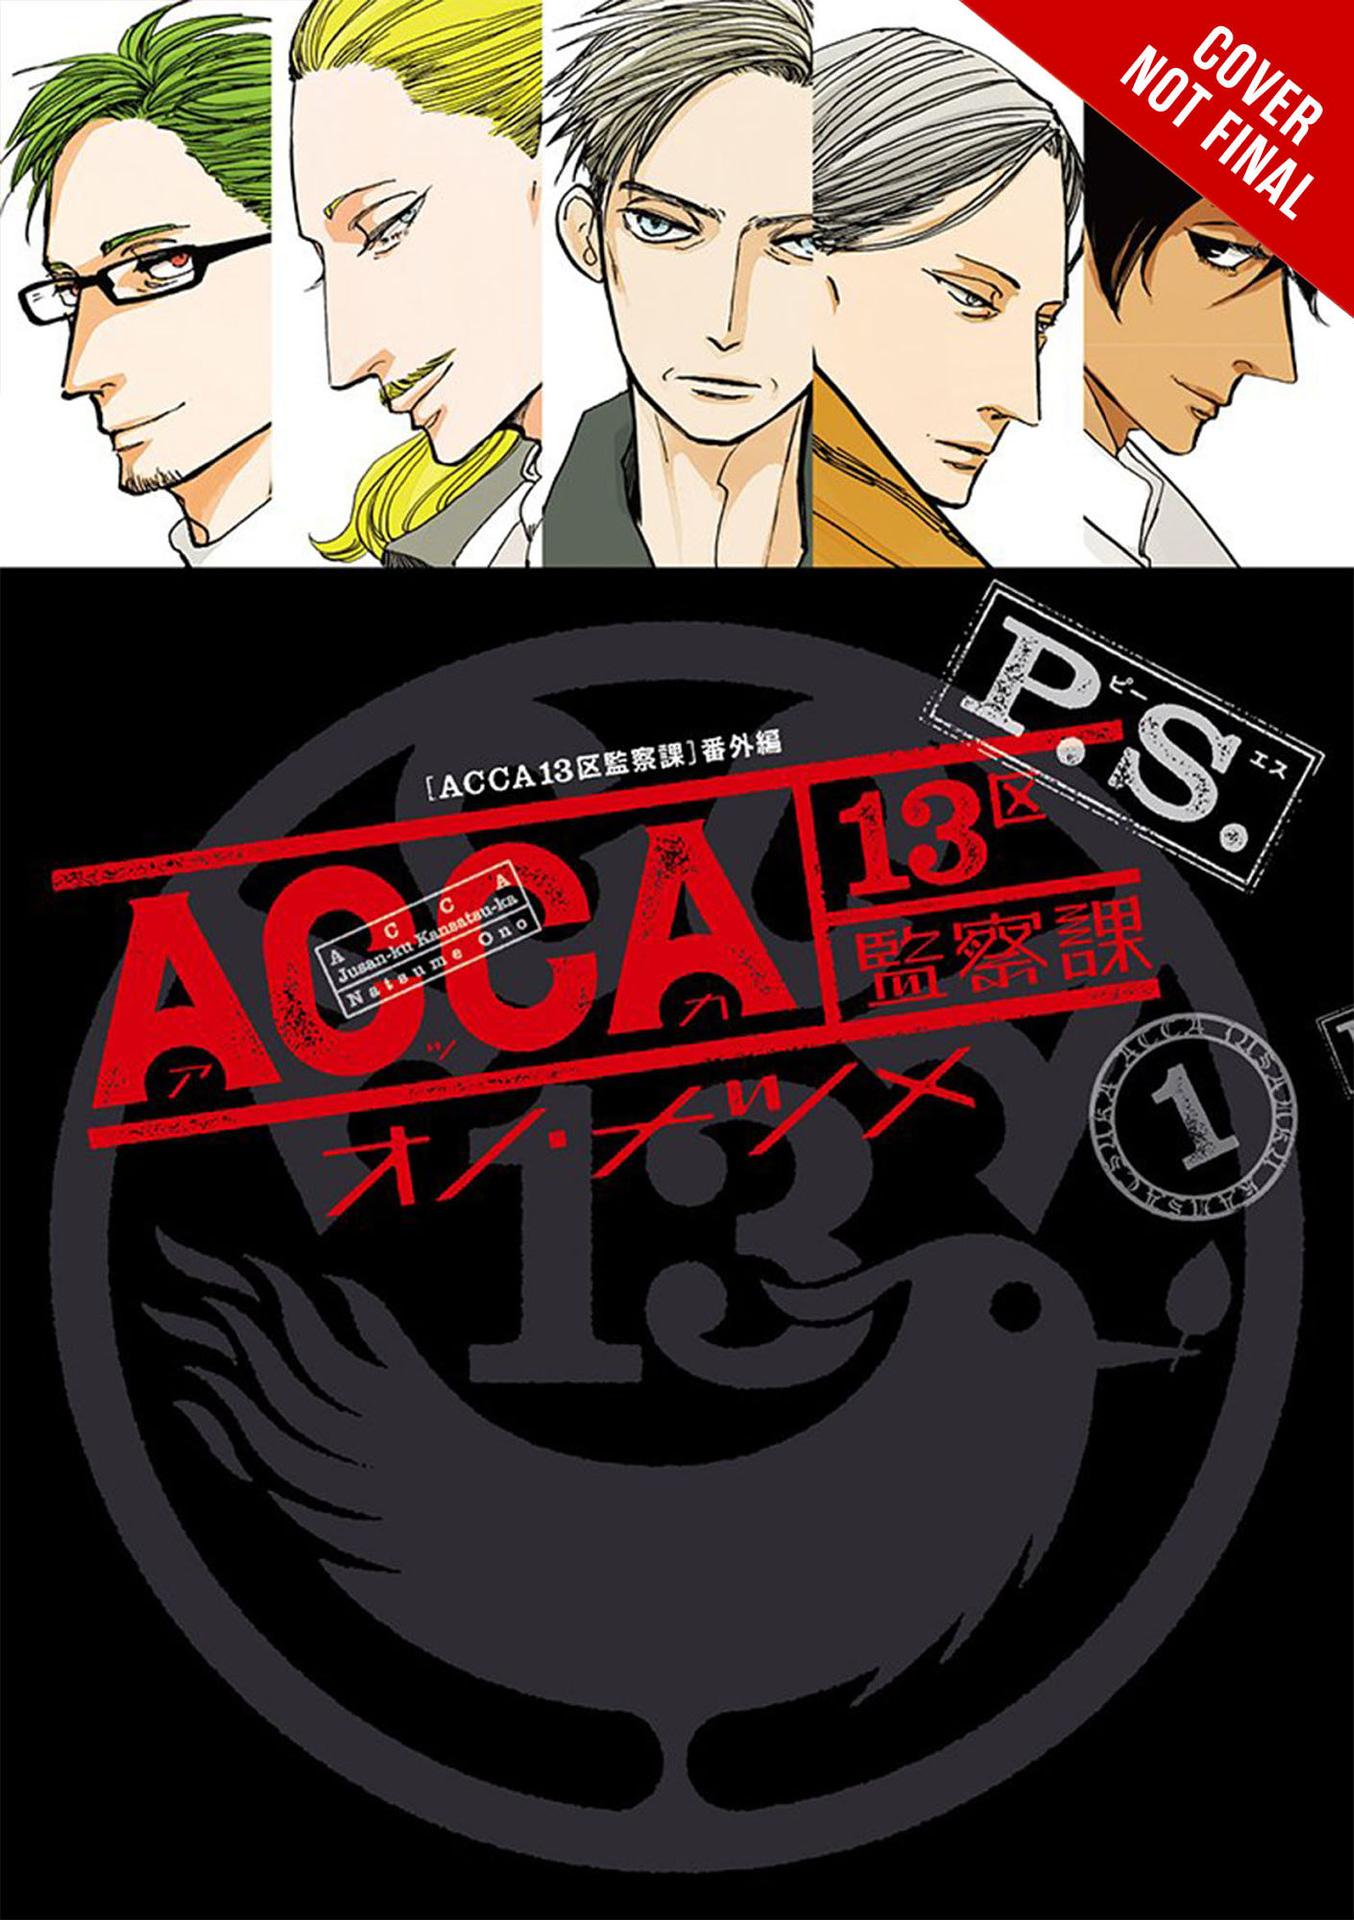 Yen Press Announces New Manga and Light Novel Titles for August 2020